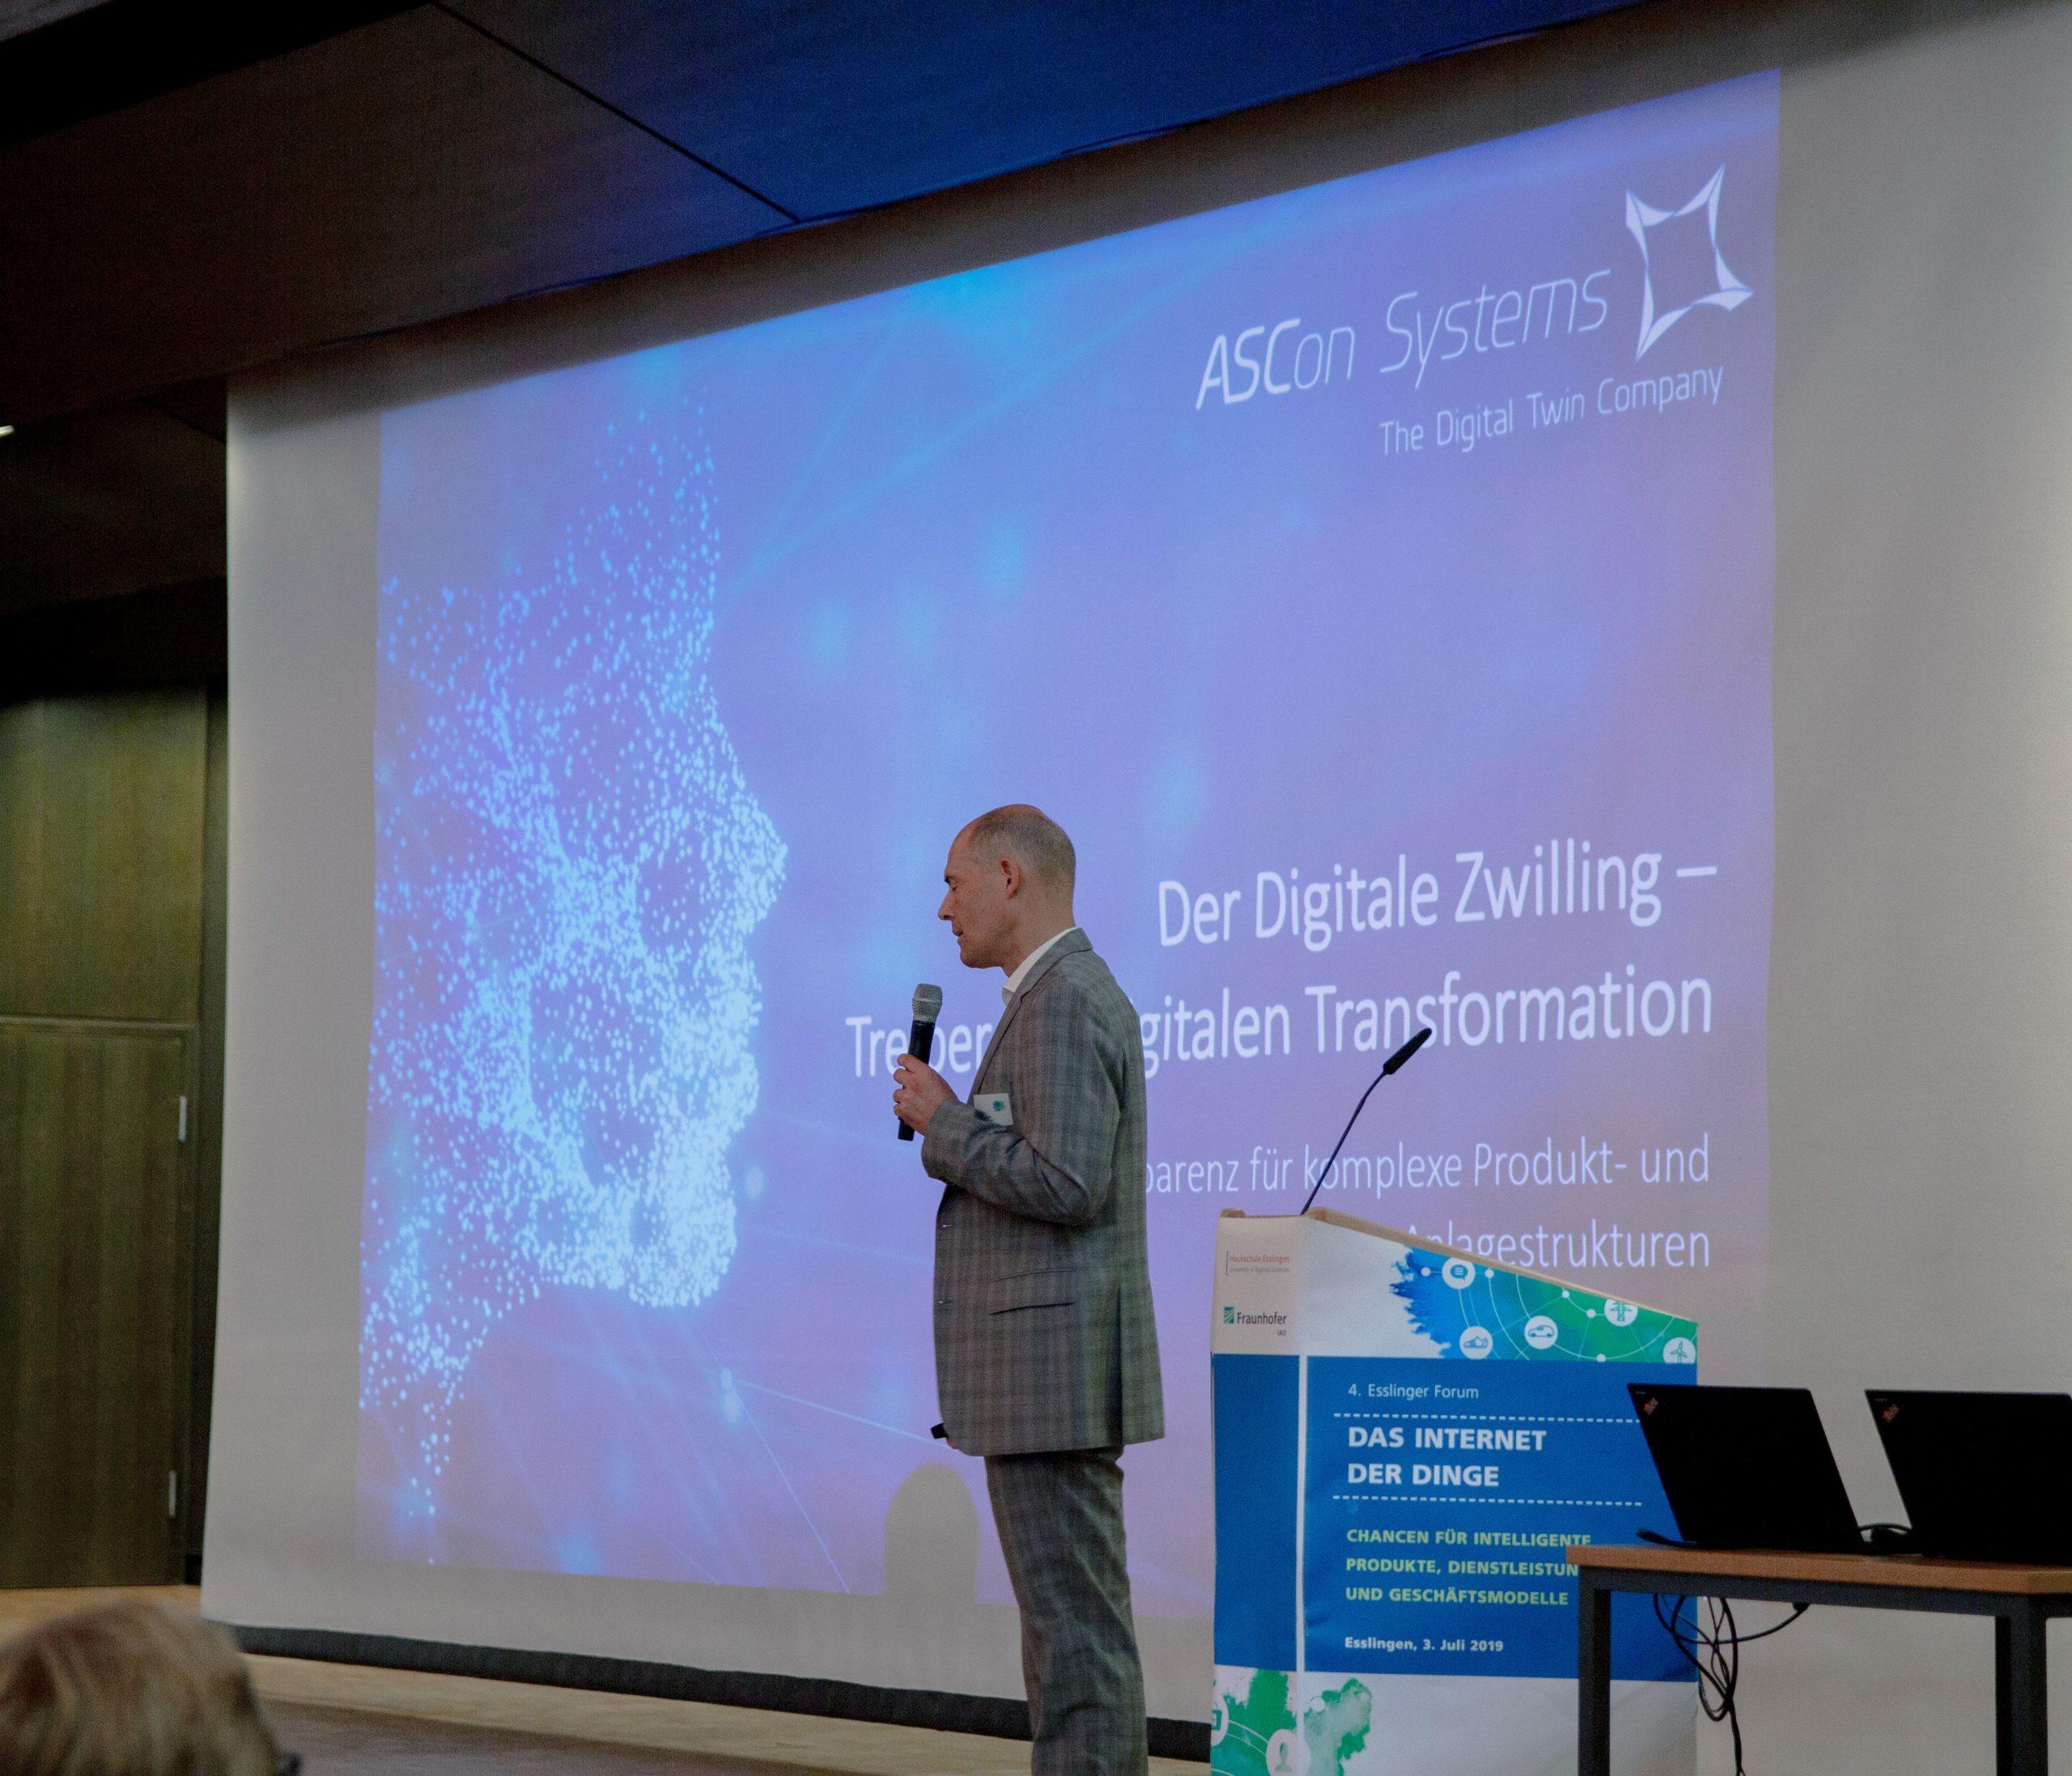 ASCon Systems auf dem 4. Esslinger Forum: Internet der Dinge